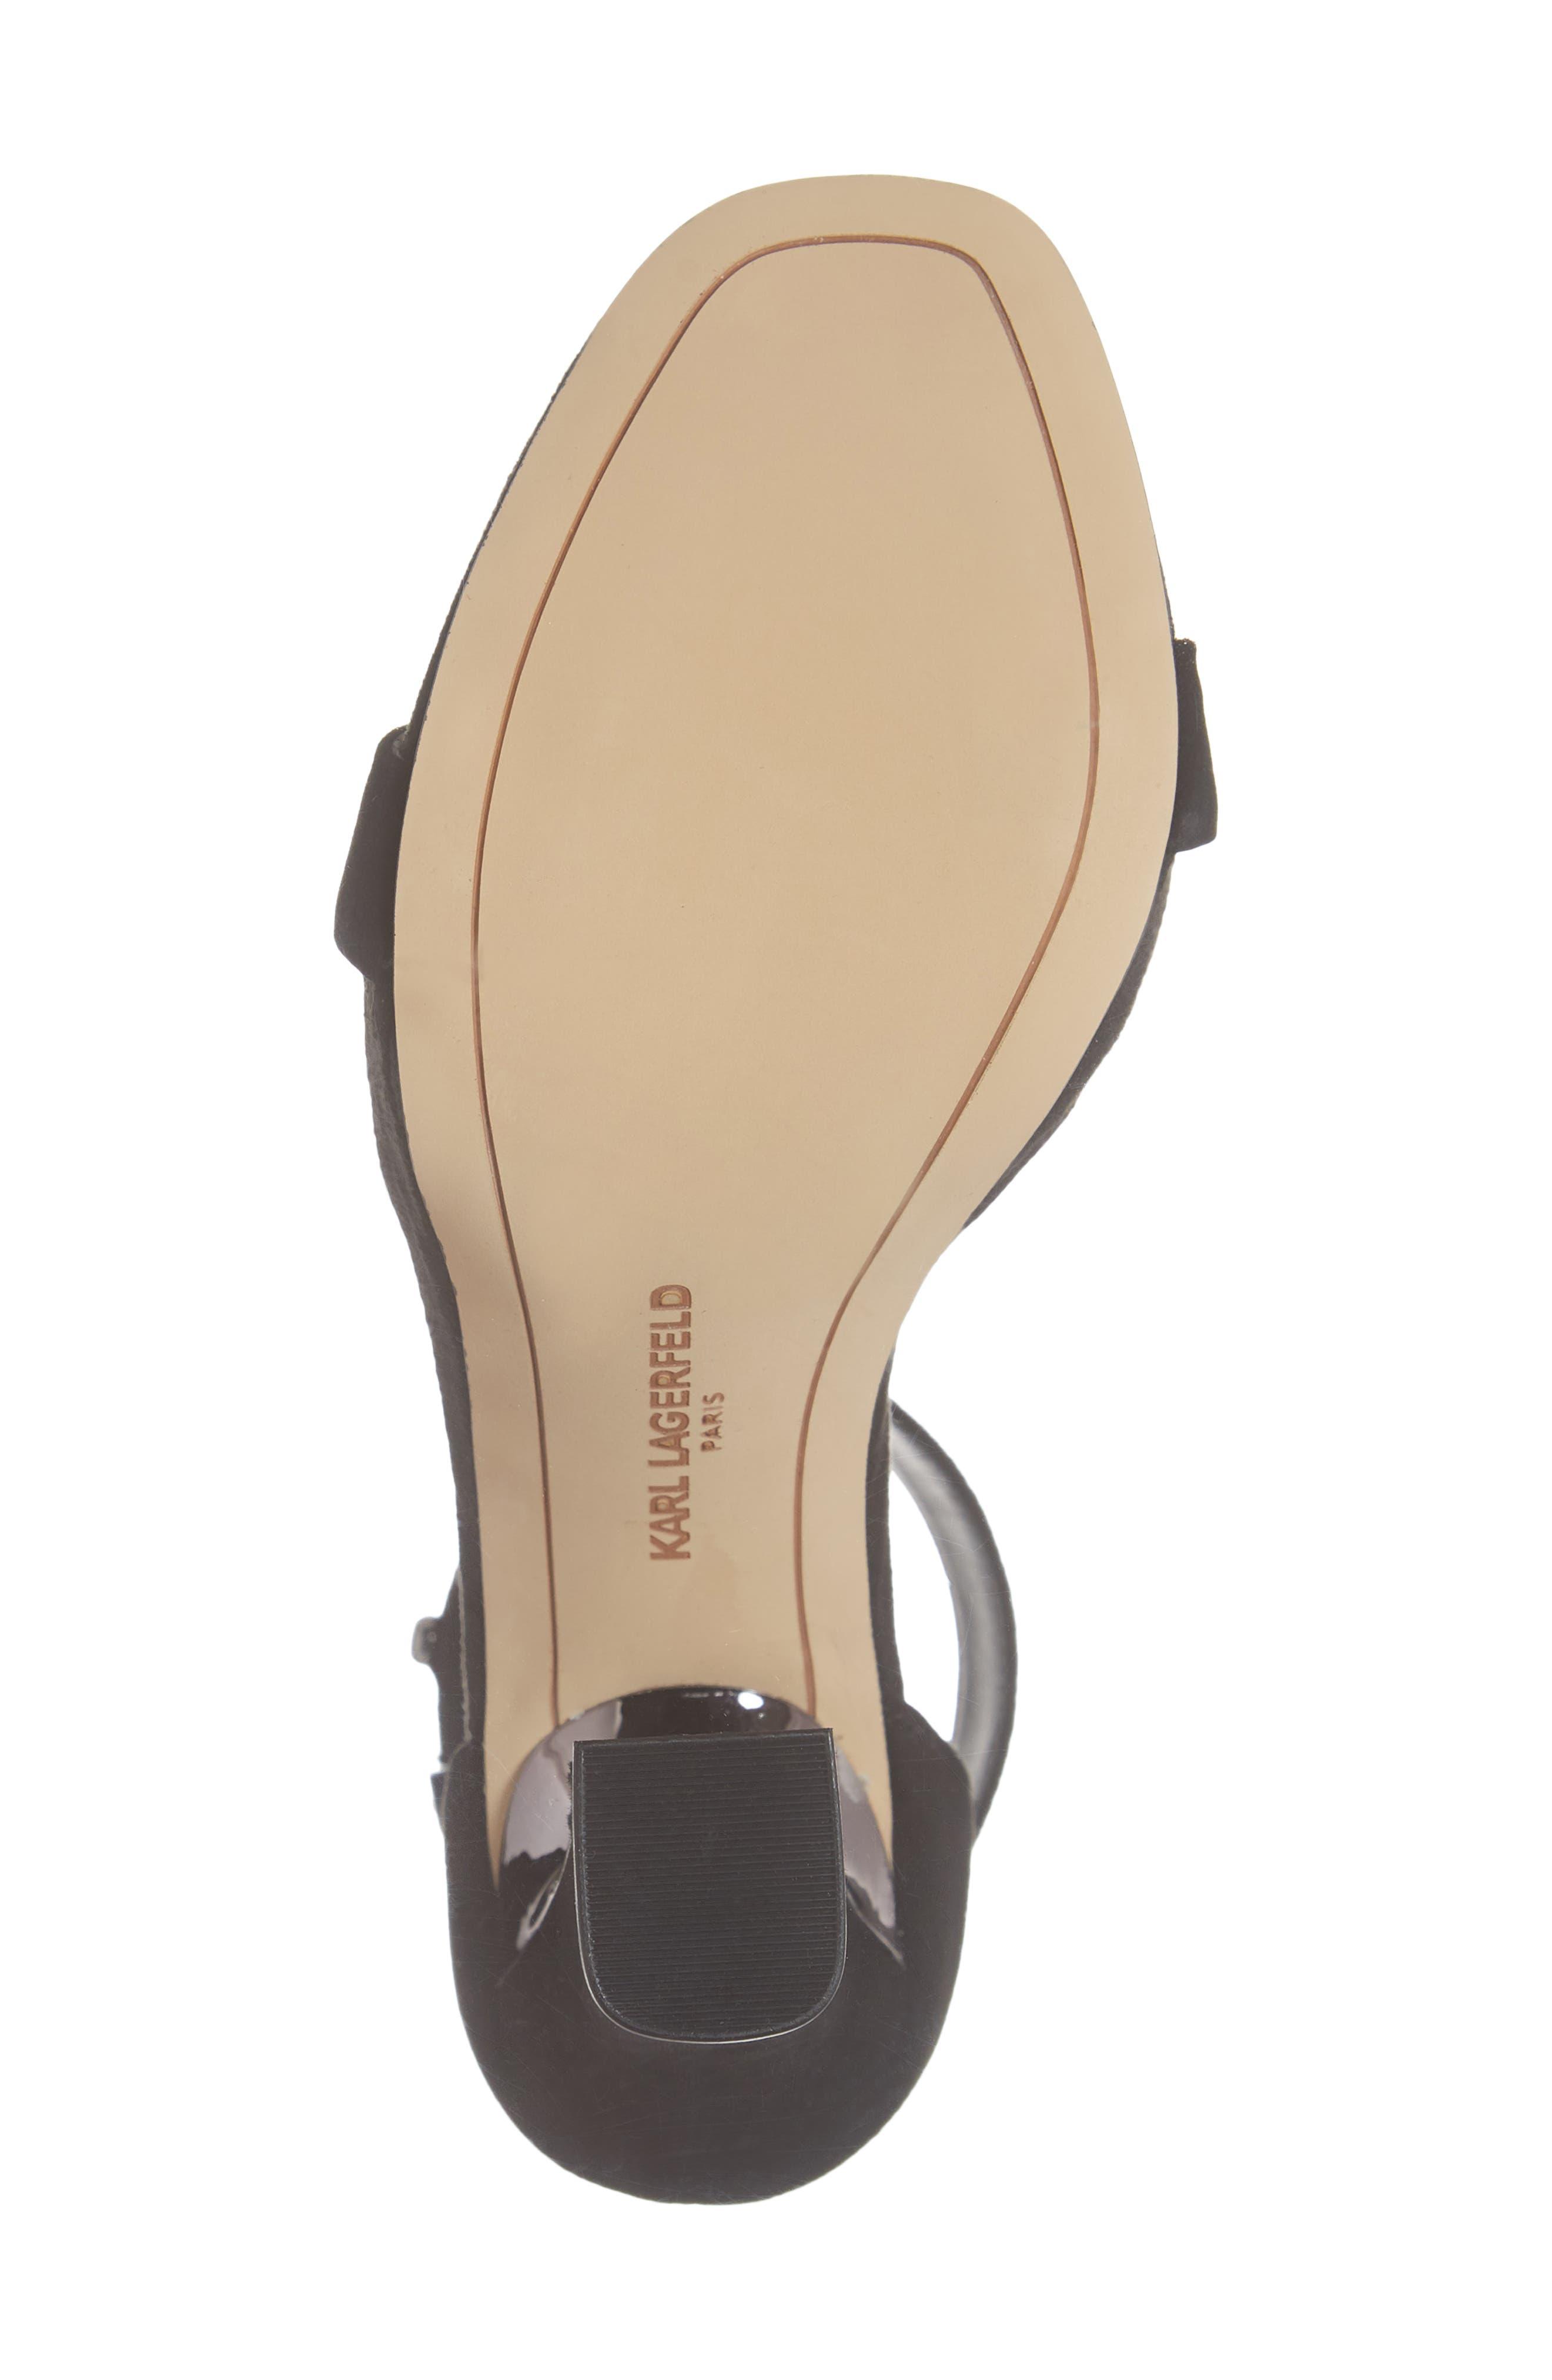 KARL LAGERFELD PARIS, Carah Ankle Strap Sandal, Alternate thumbnail 6, color, BLACK SUEDE